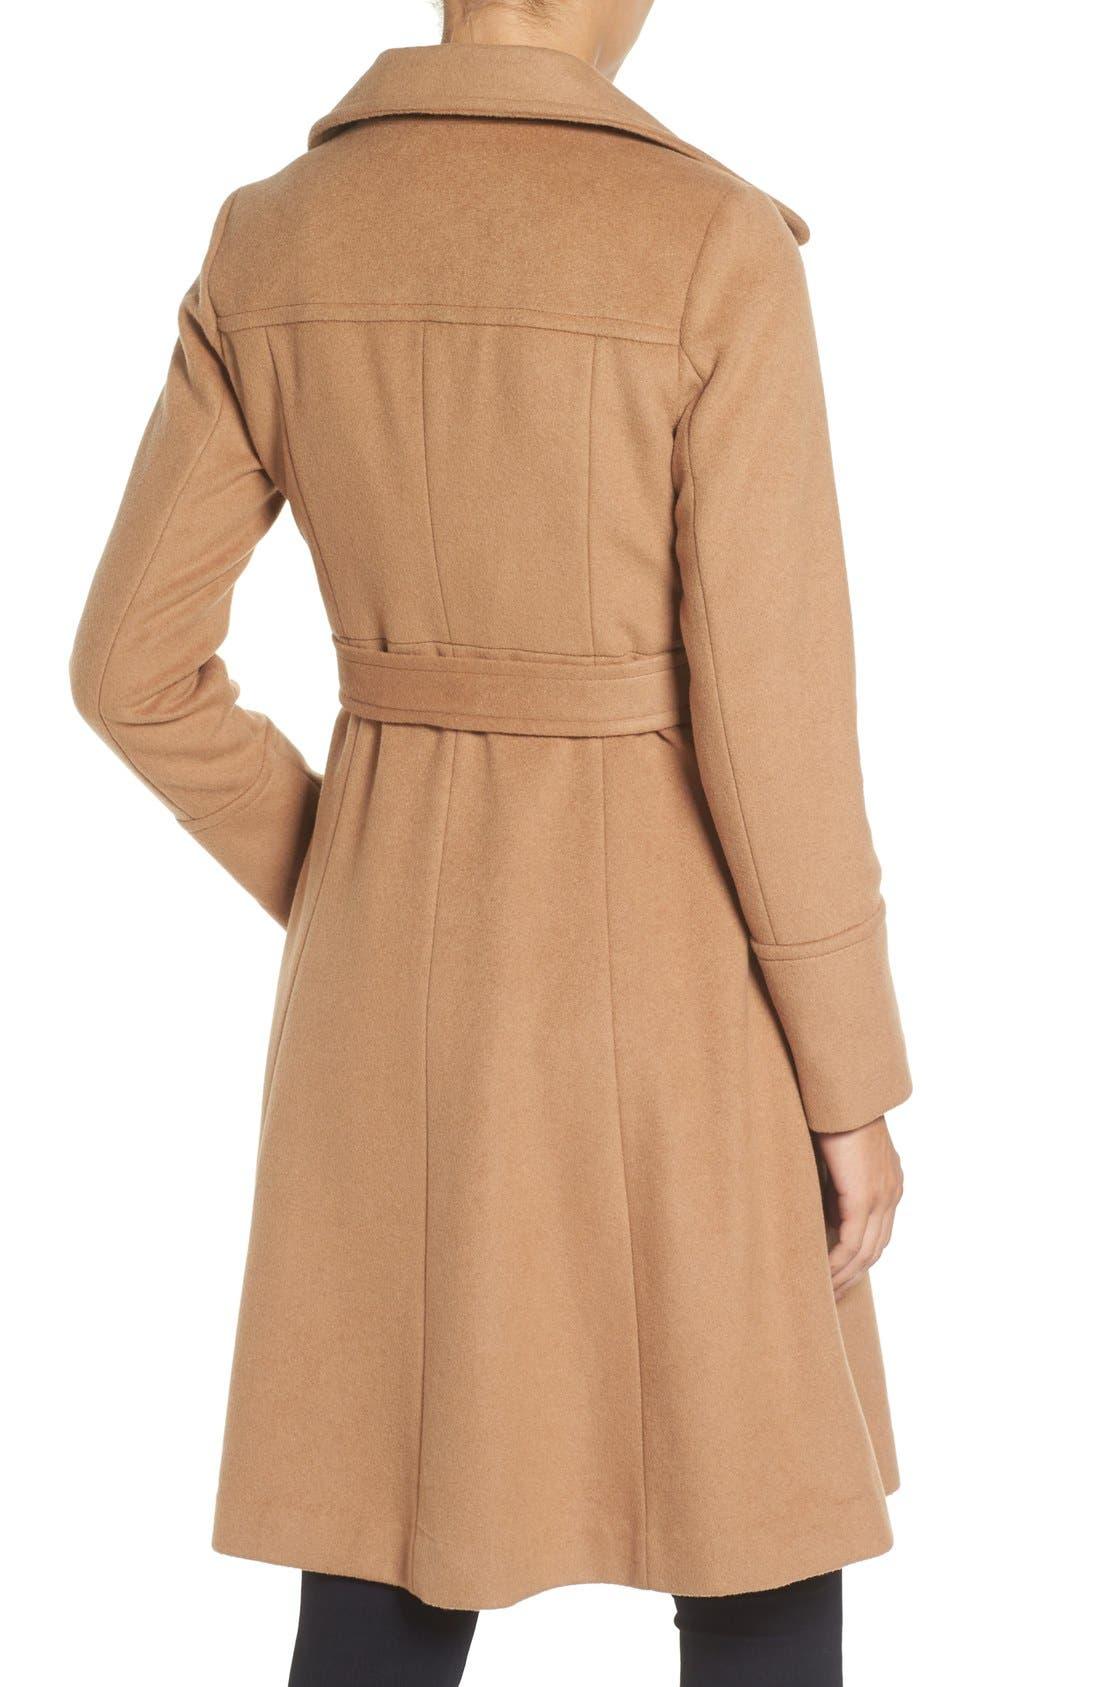 Alternate Image 2  - Eliza J Luxe Wool Blend Belted Long A-Line Coat